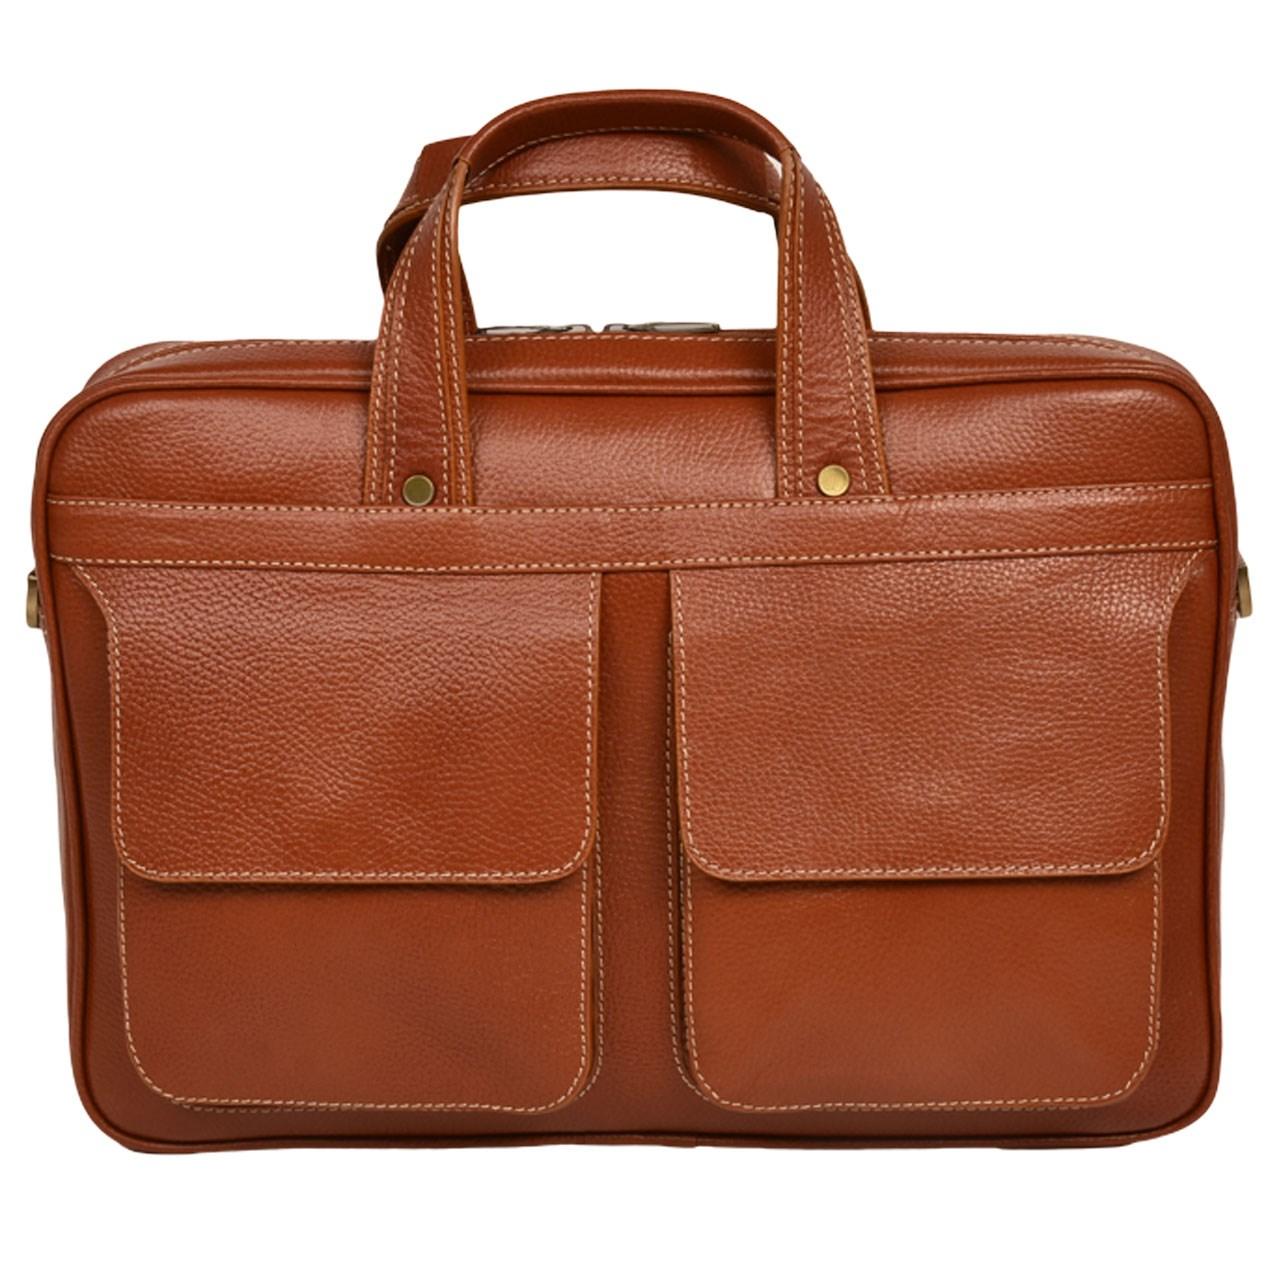 کیف اداری چرم طبیعی کهن چرم مدل L85-1